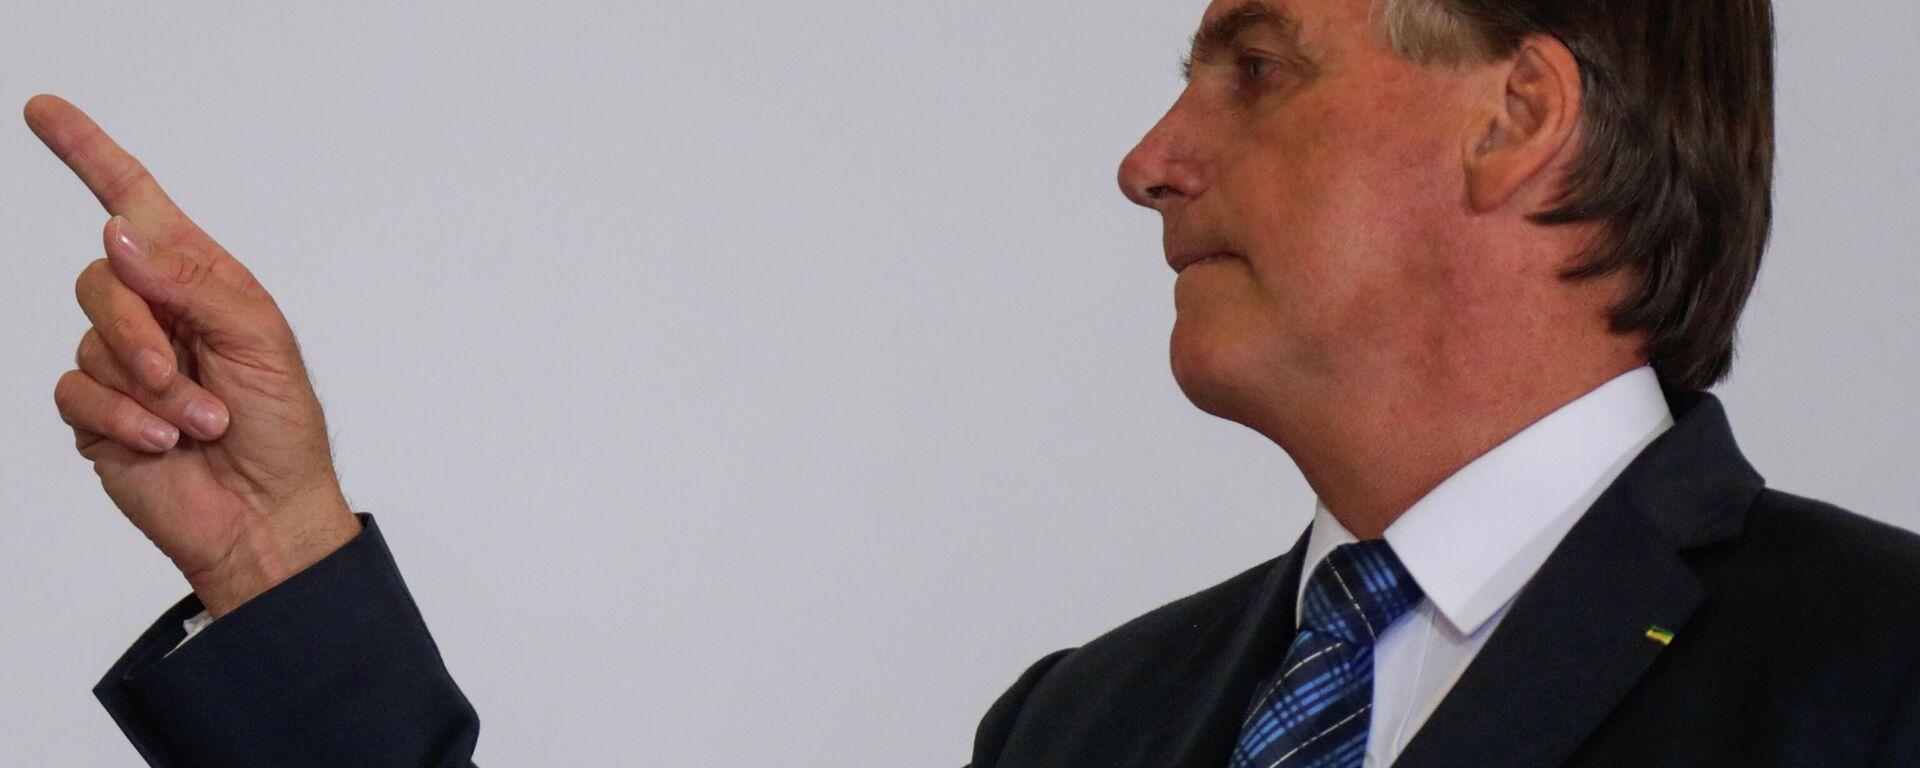 Jair Bolsonaro, presidente de Brasil - Sputnik Mundo, 1920, 04.03.2021